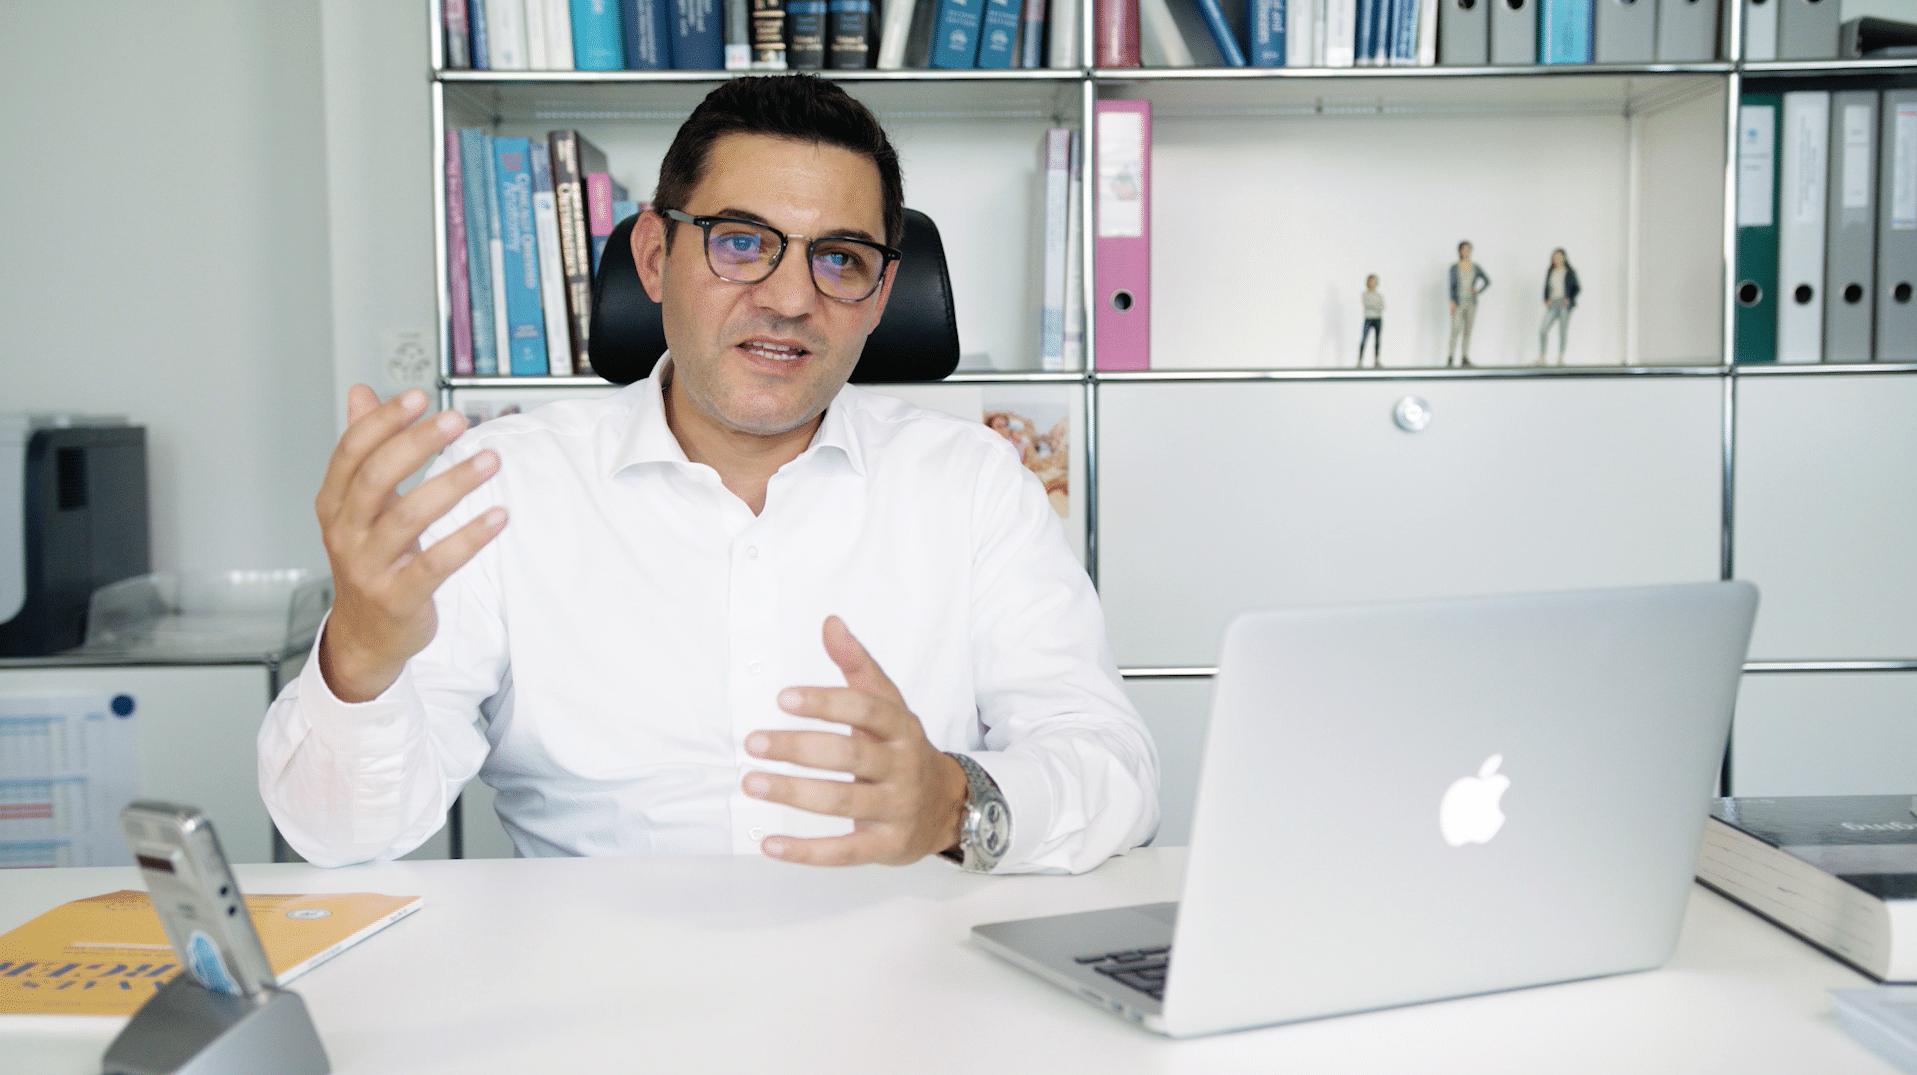 Prof. Dr. med Antonio Nocito am Laptop